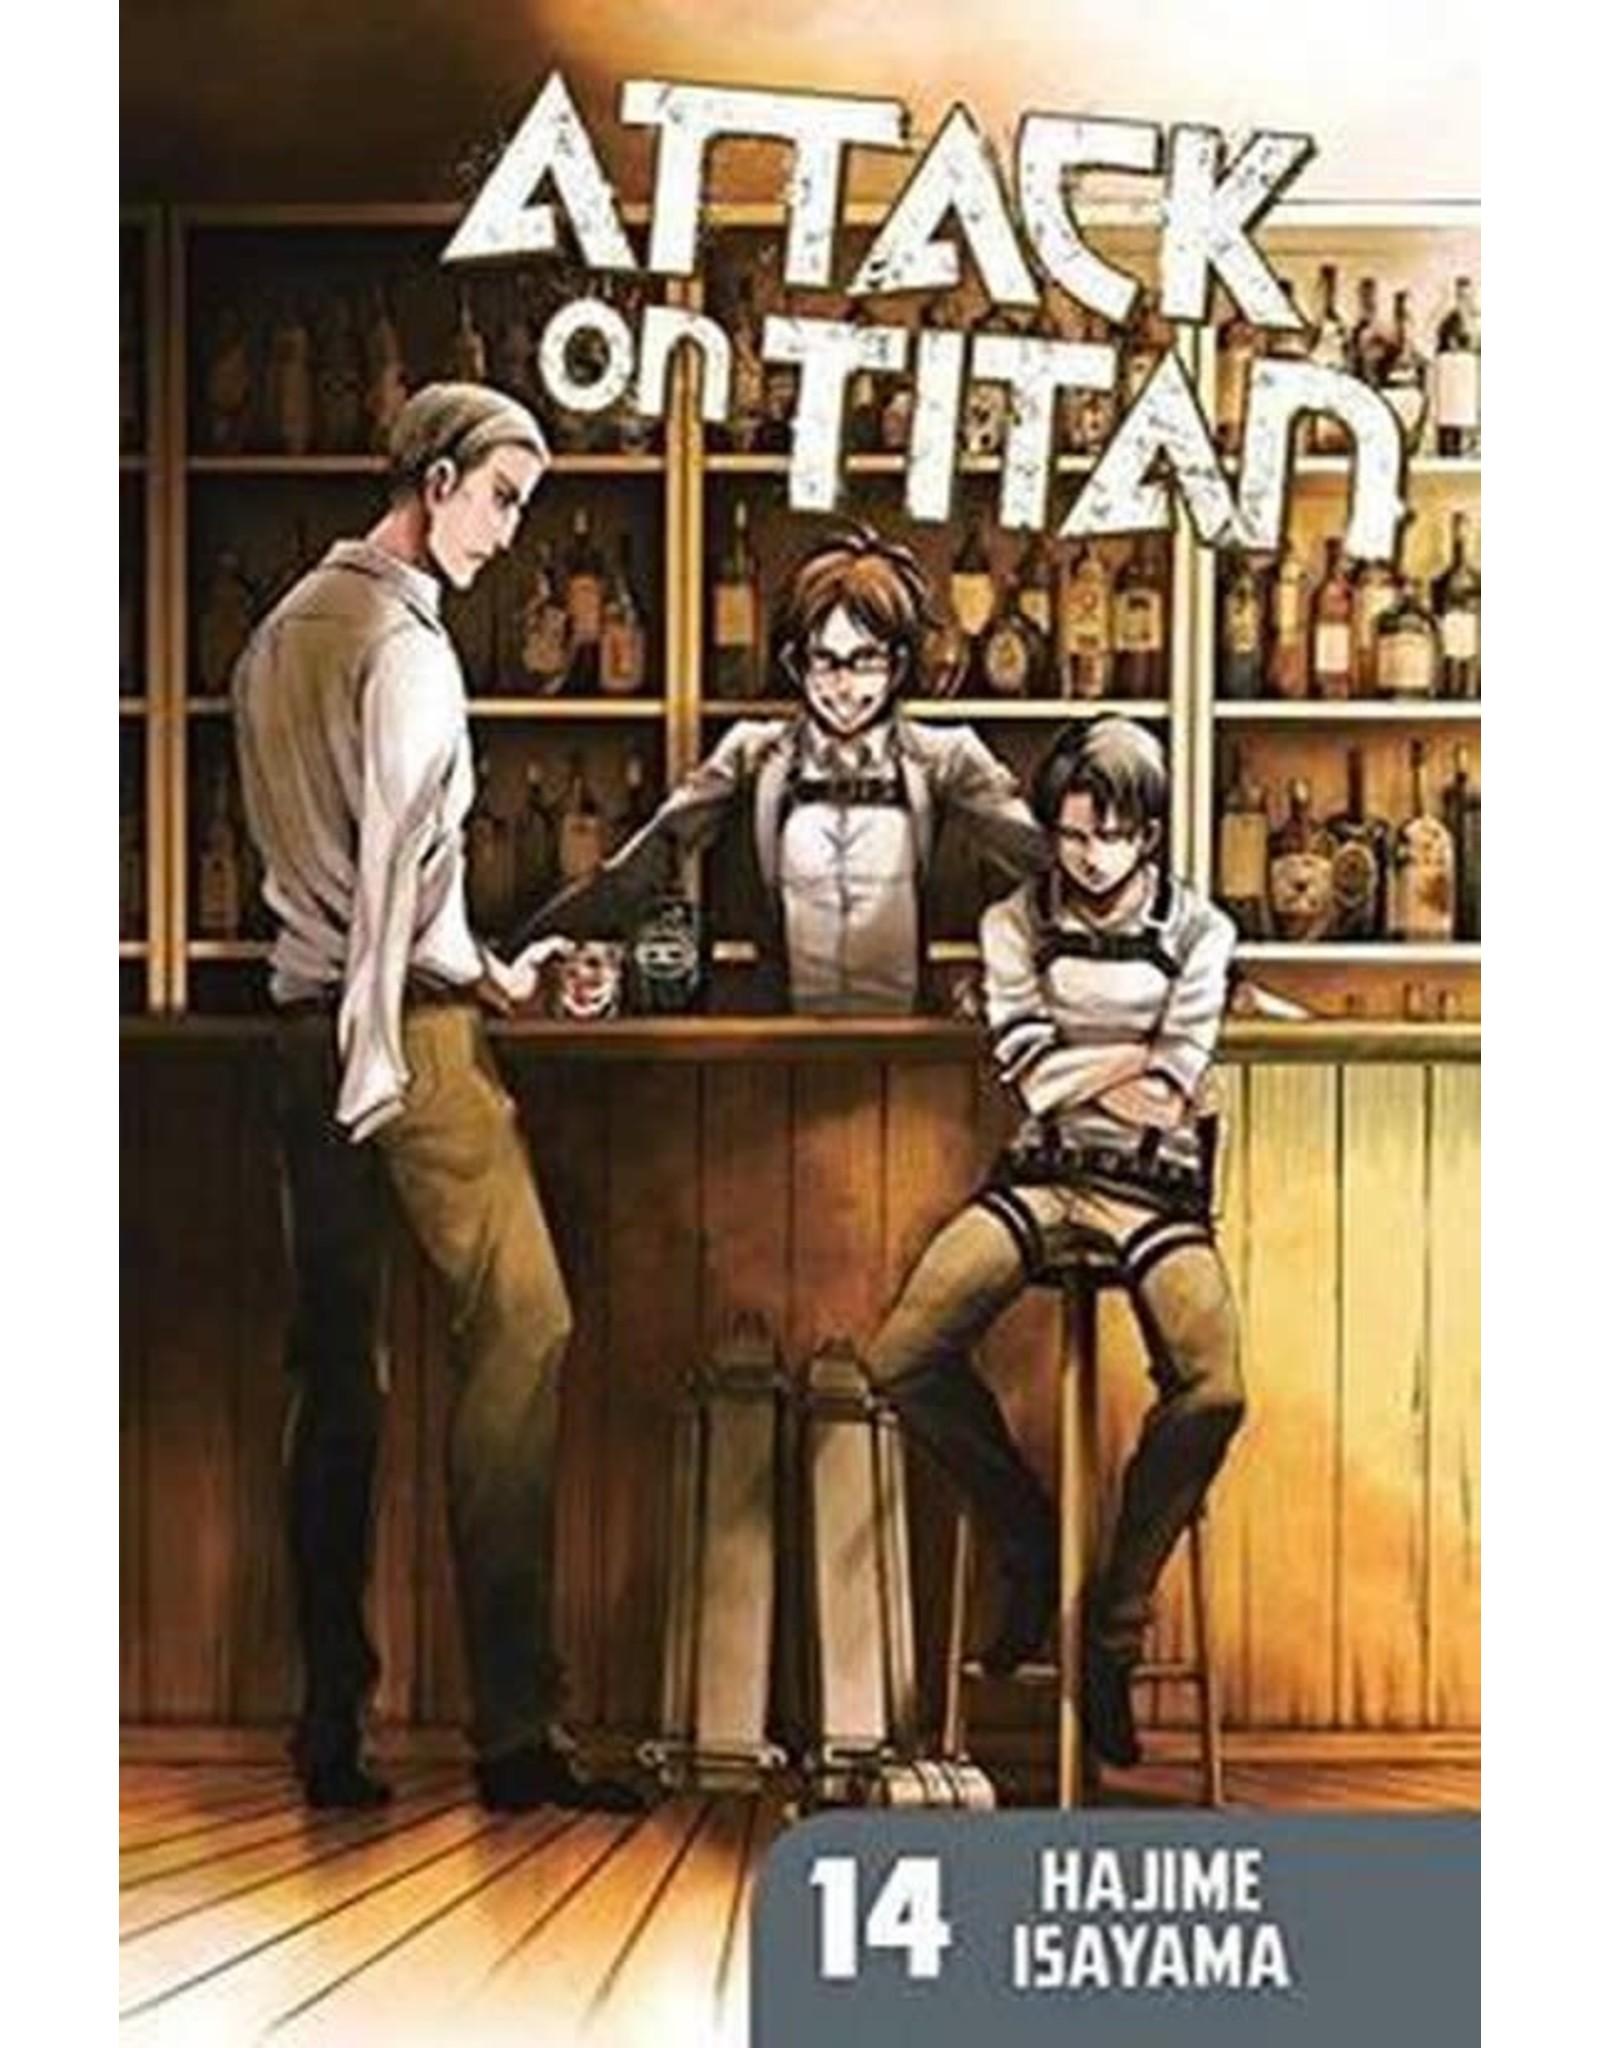 Attack on Titan 14 (English) - Manga